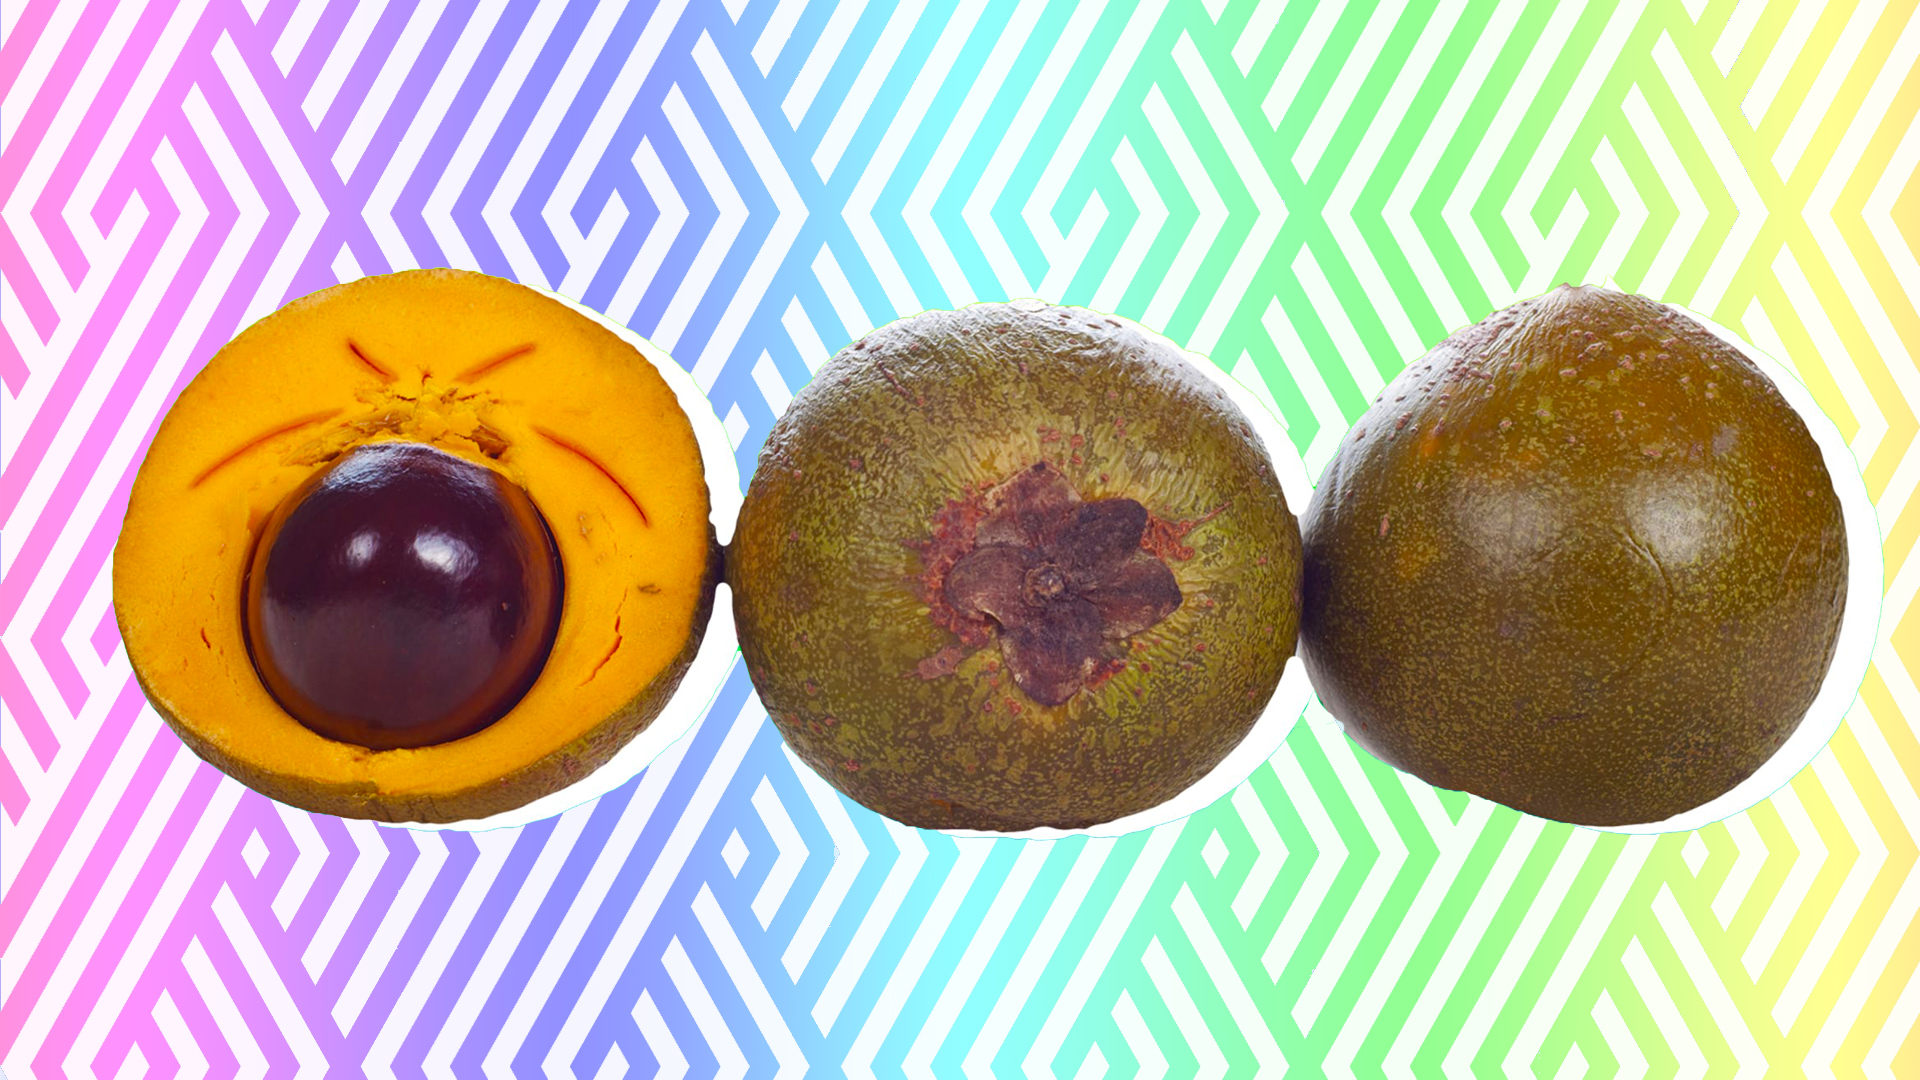 Meet Your Favorite New Superfood: Lucuma